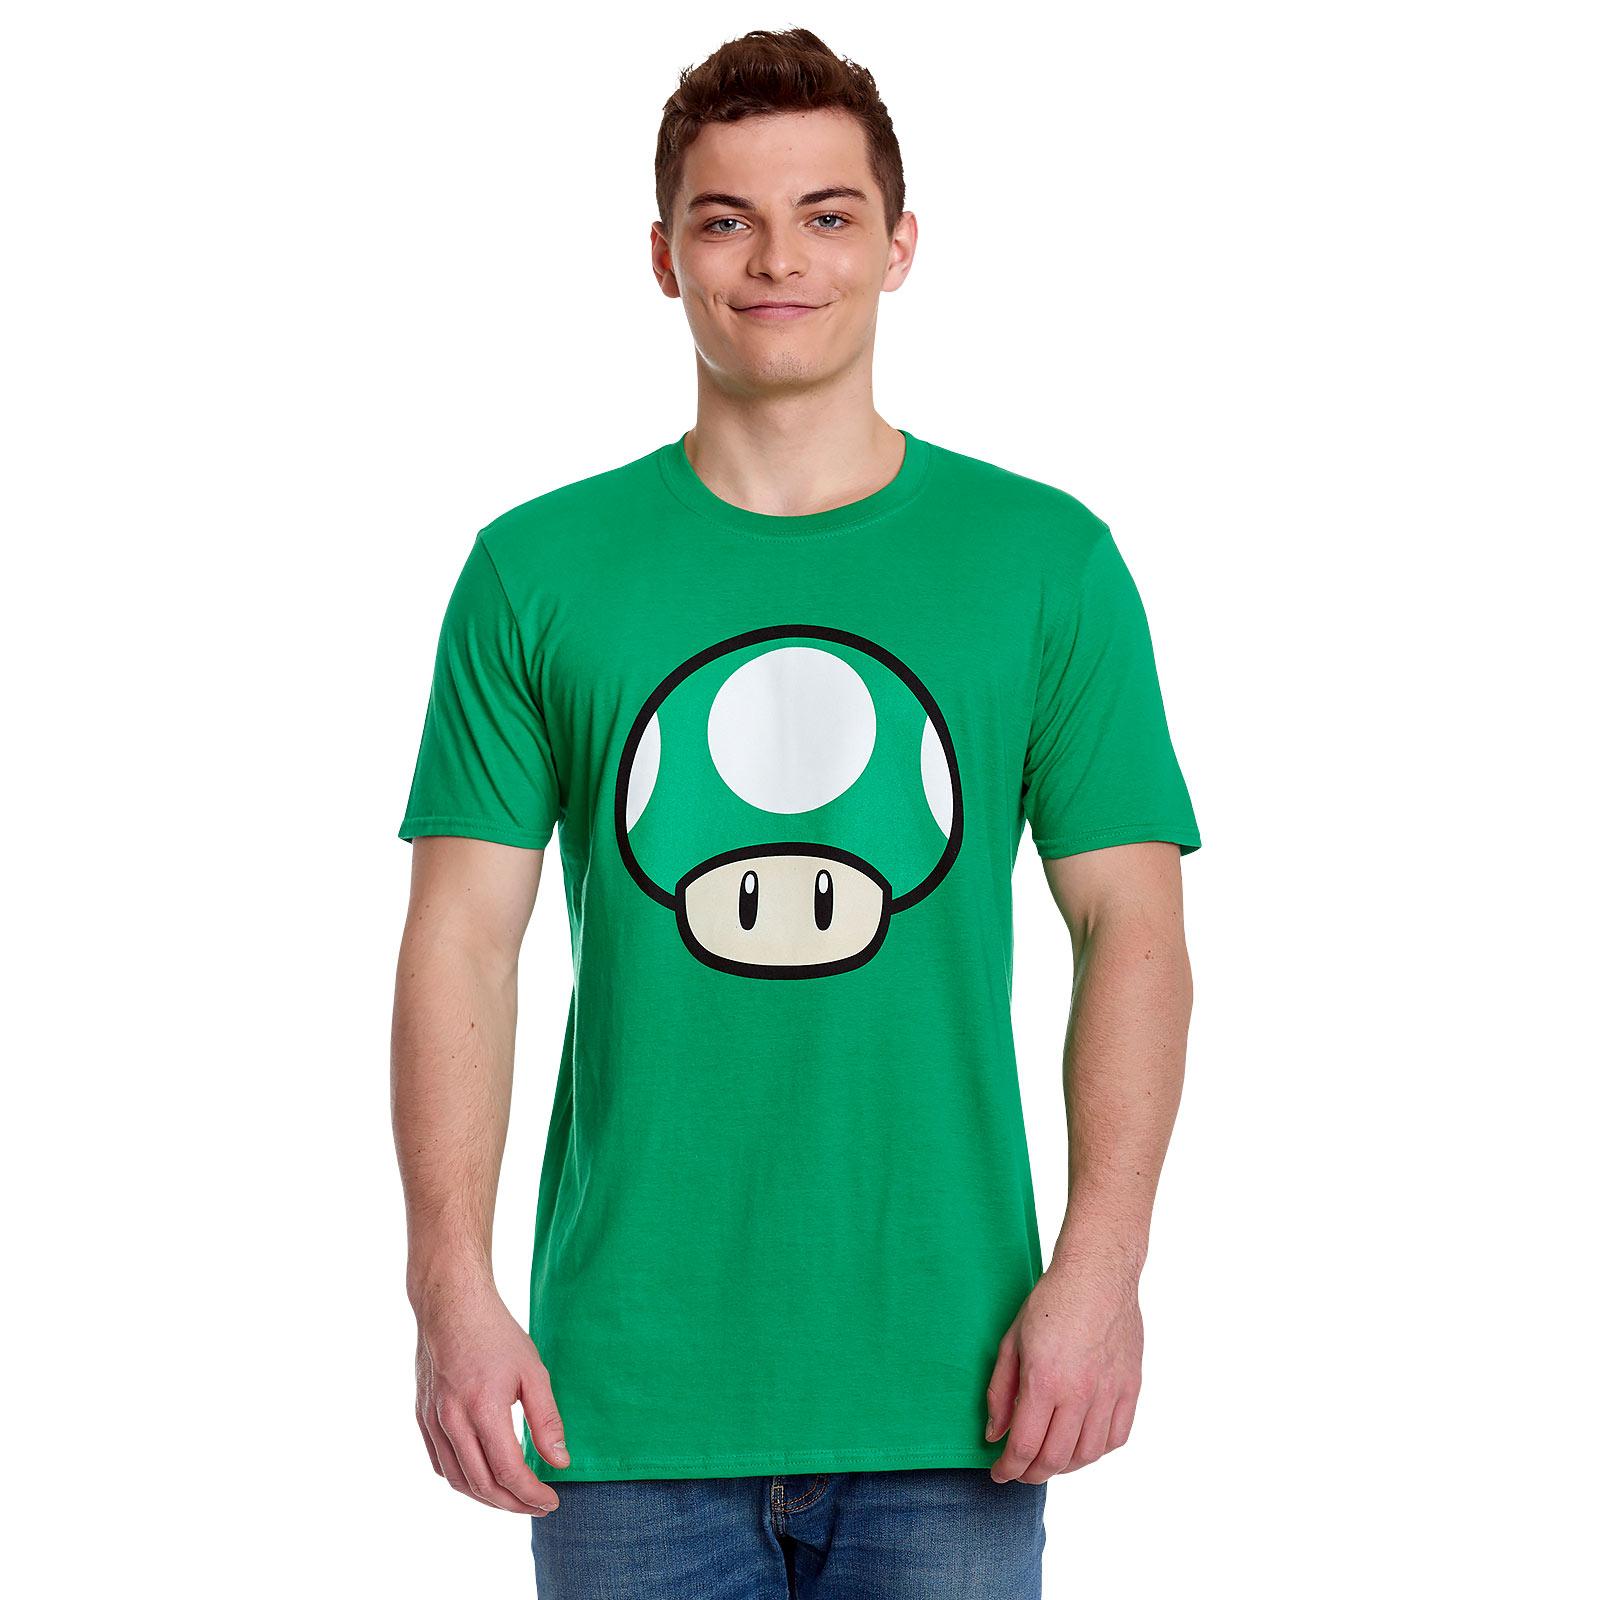 Super Mario - 1 UP Pilz T-Shirt grün